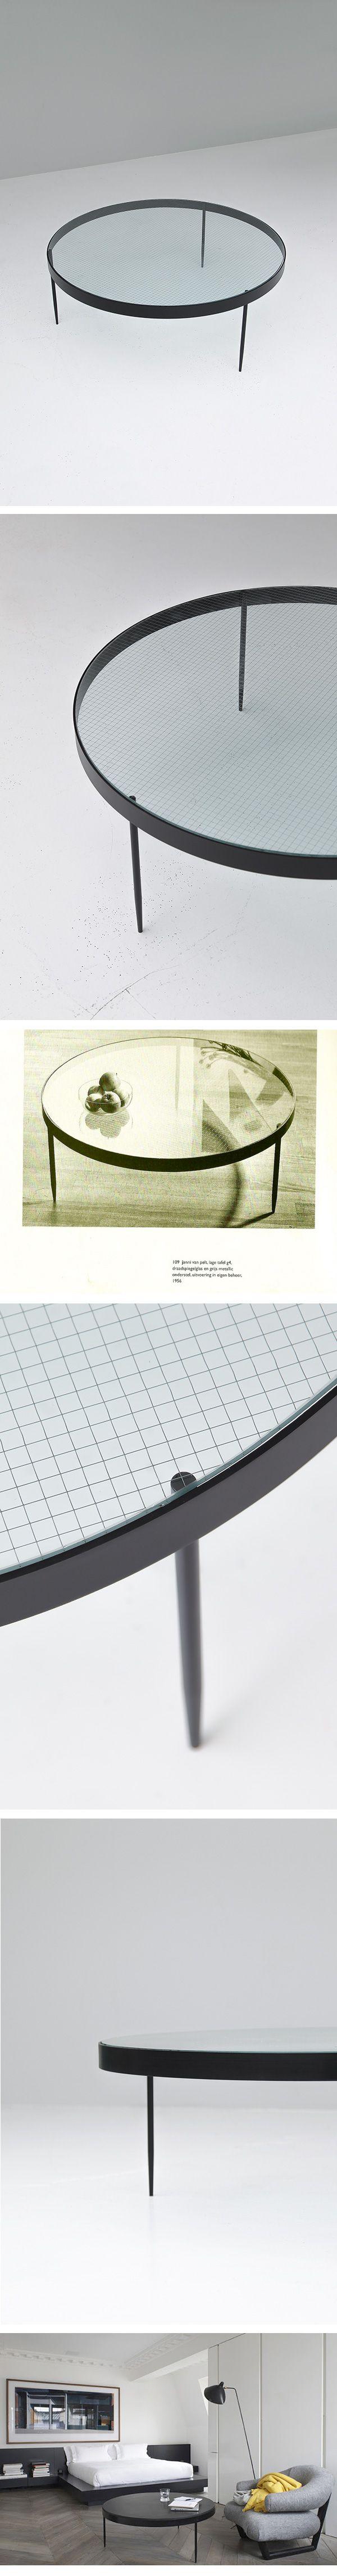 Jannie Van Pelt, coffee table, 1950s, modernist, dutch, design